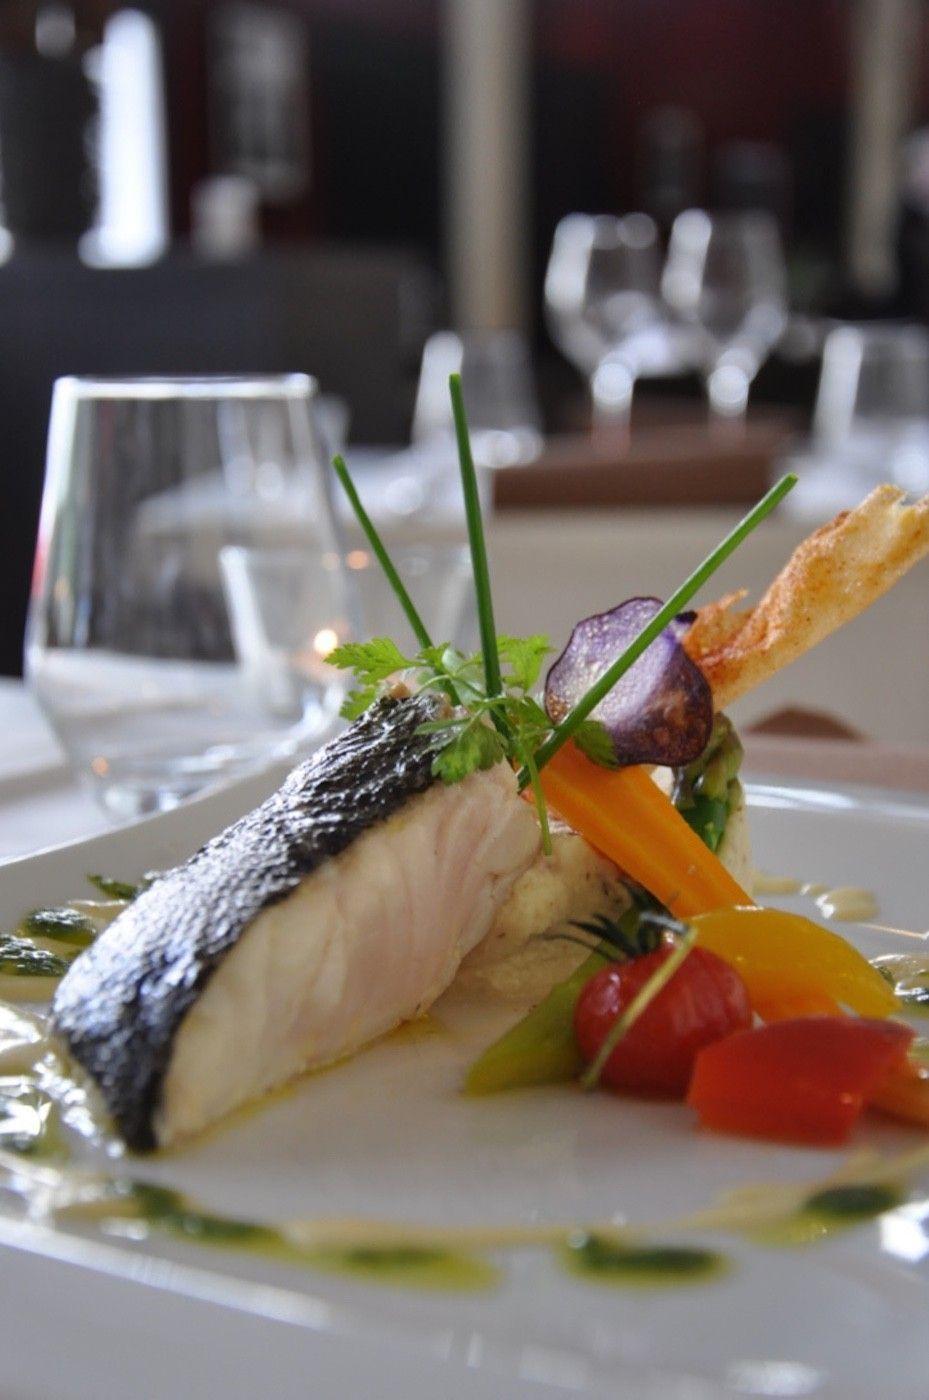 Restaurant Cote Cour Cote Jardin Geneva Reservation Lunch Geneva